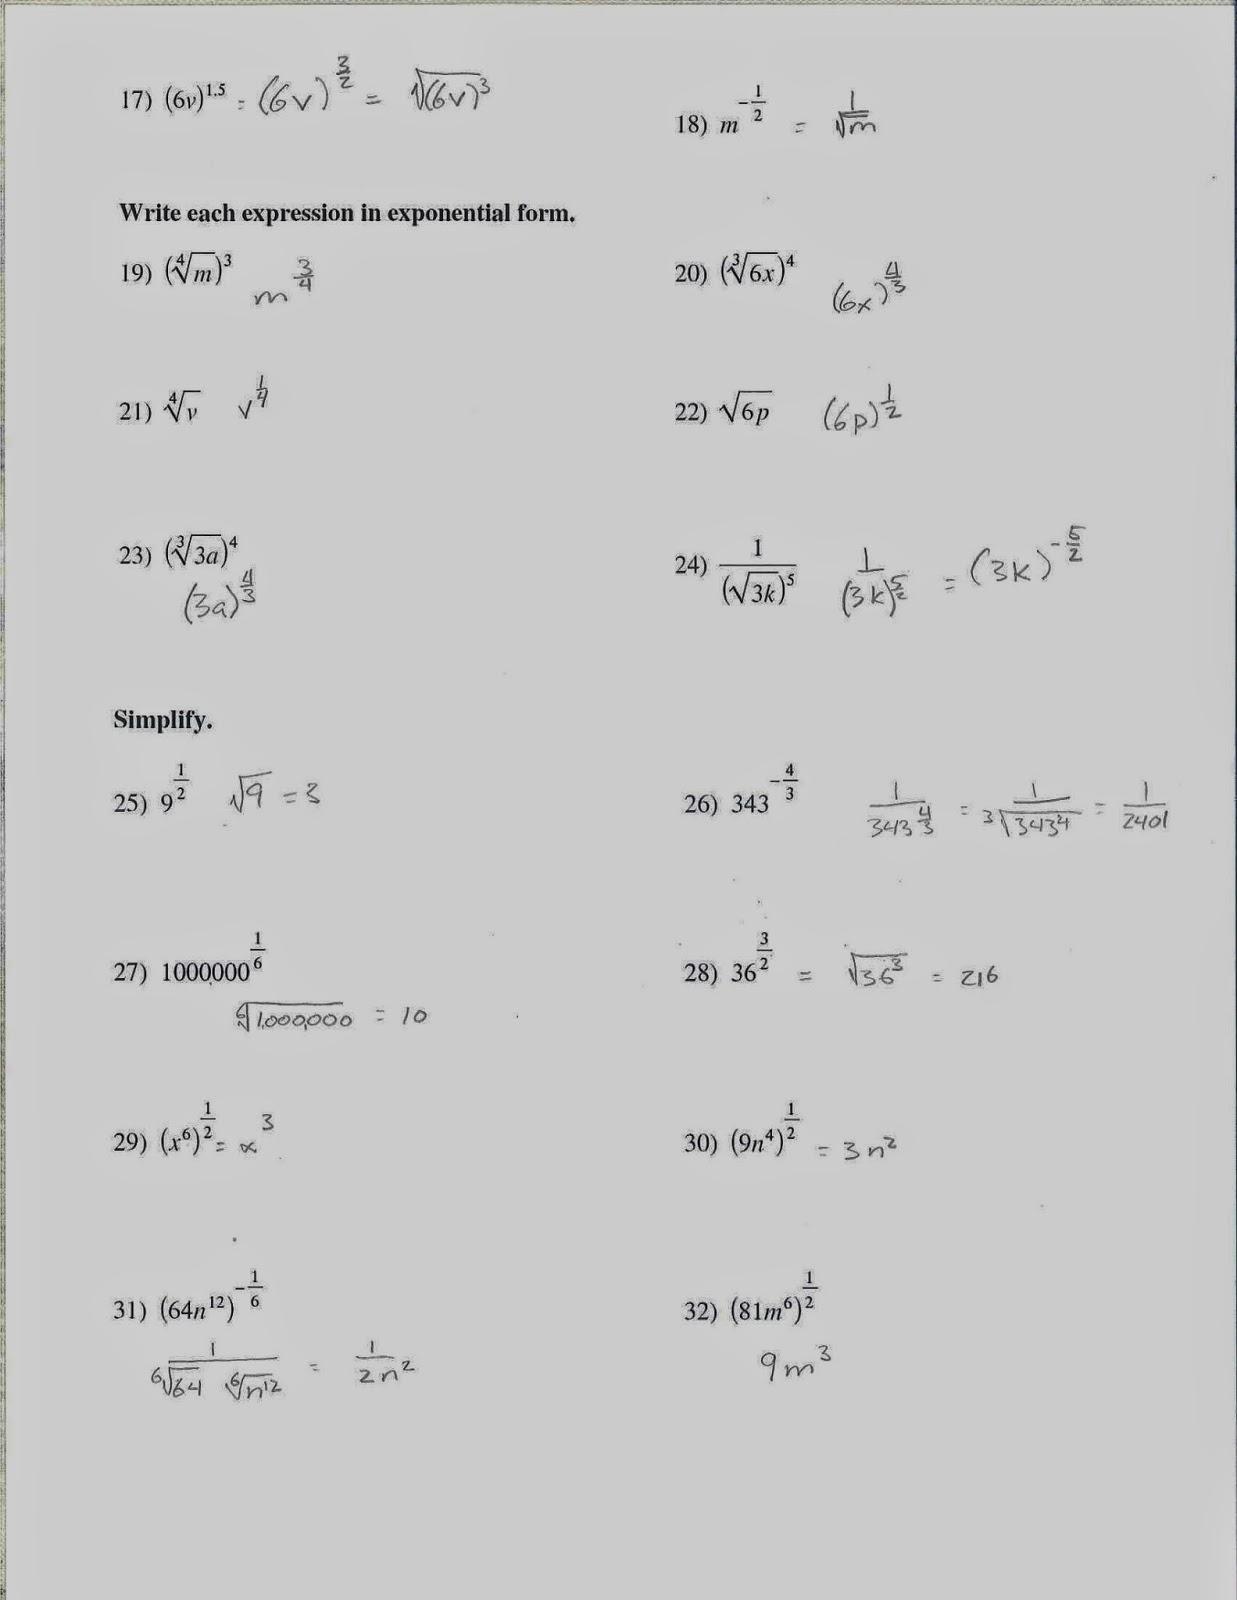 Mr Doran S Algebra 2 Radicals And Rational Graph Quiz